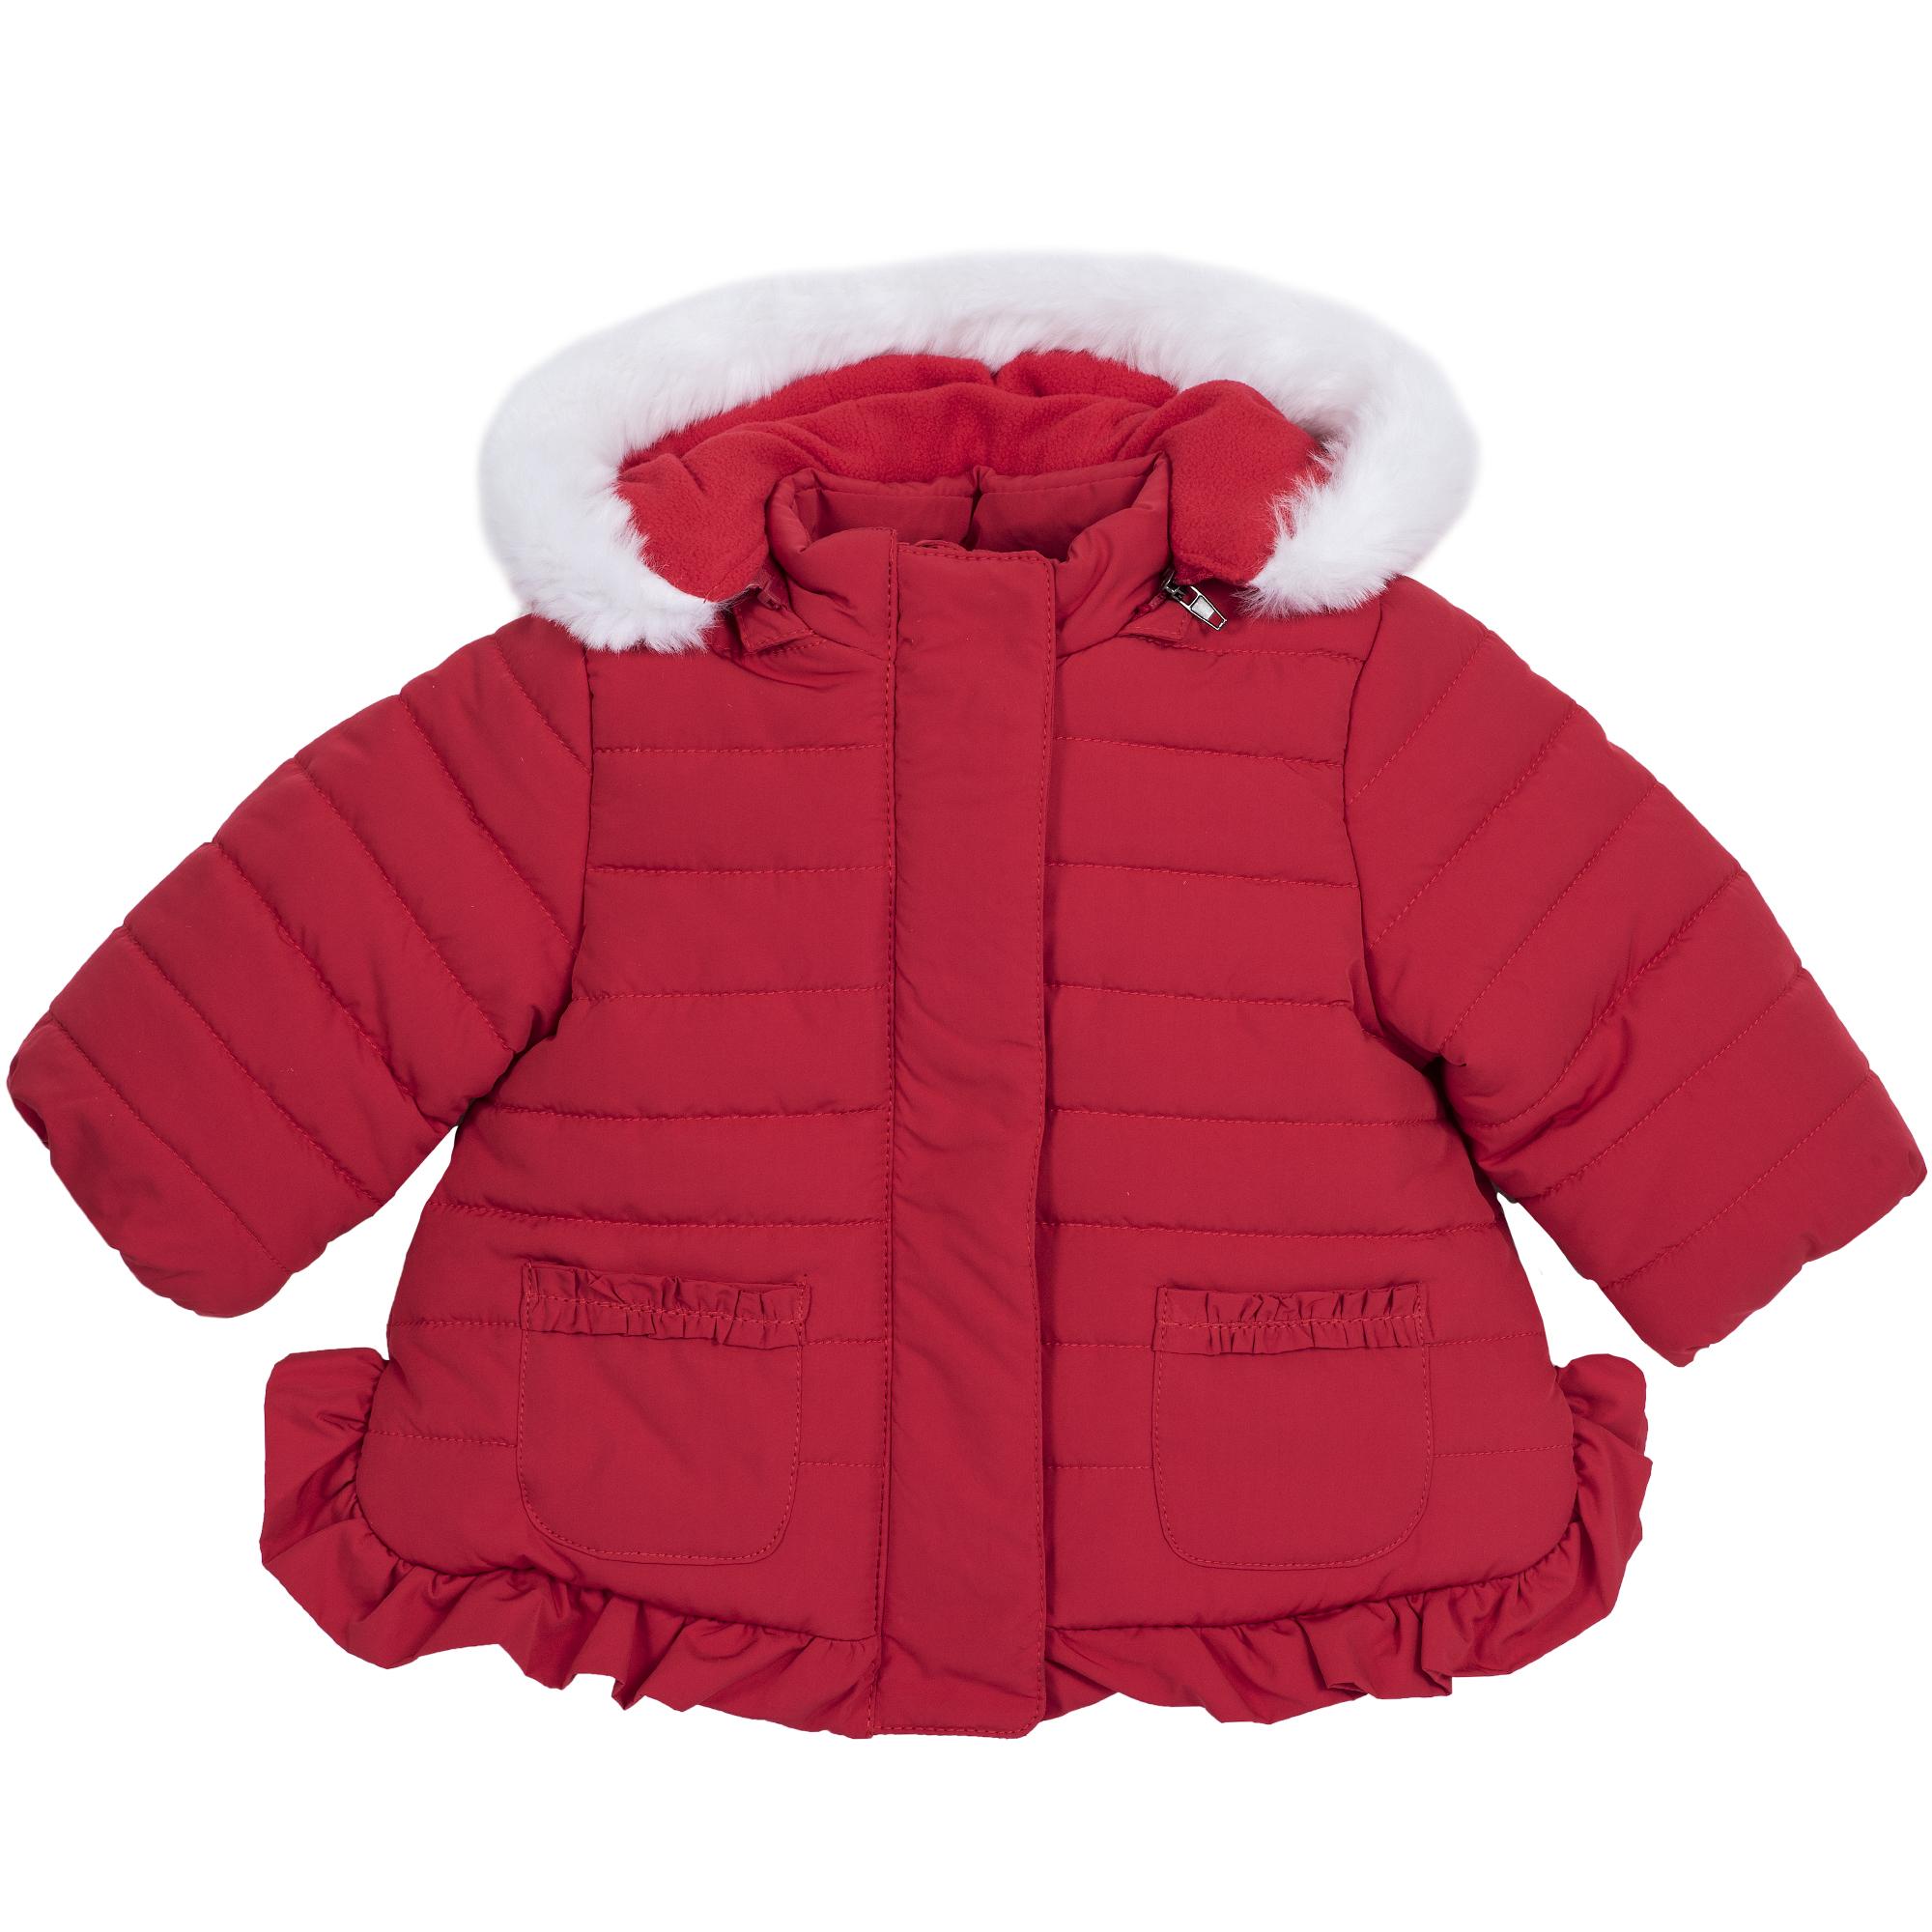 Jacheta copii Chicco THERMOSOFT, gluga detasabile, rosu, 87429